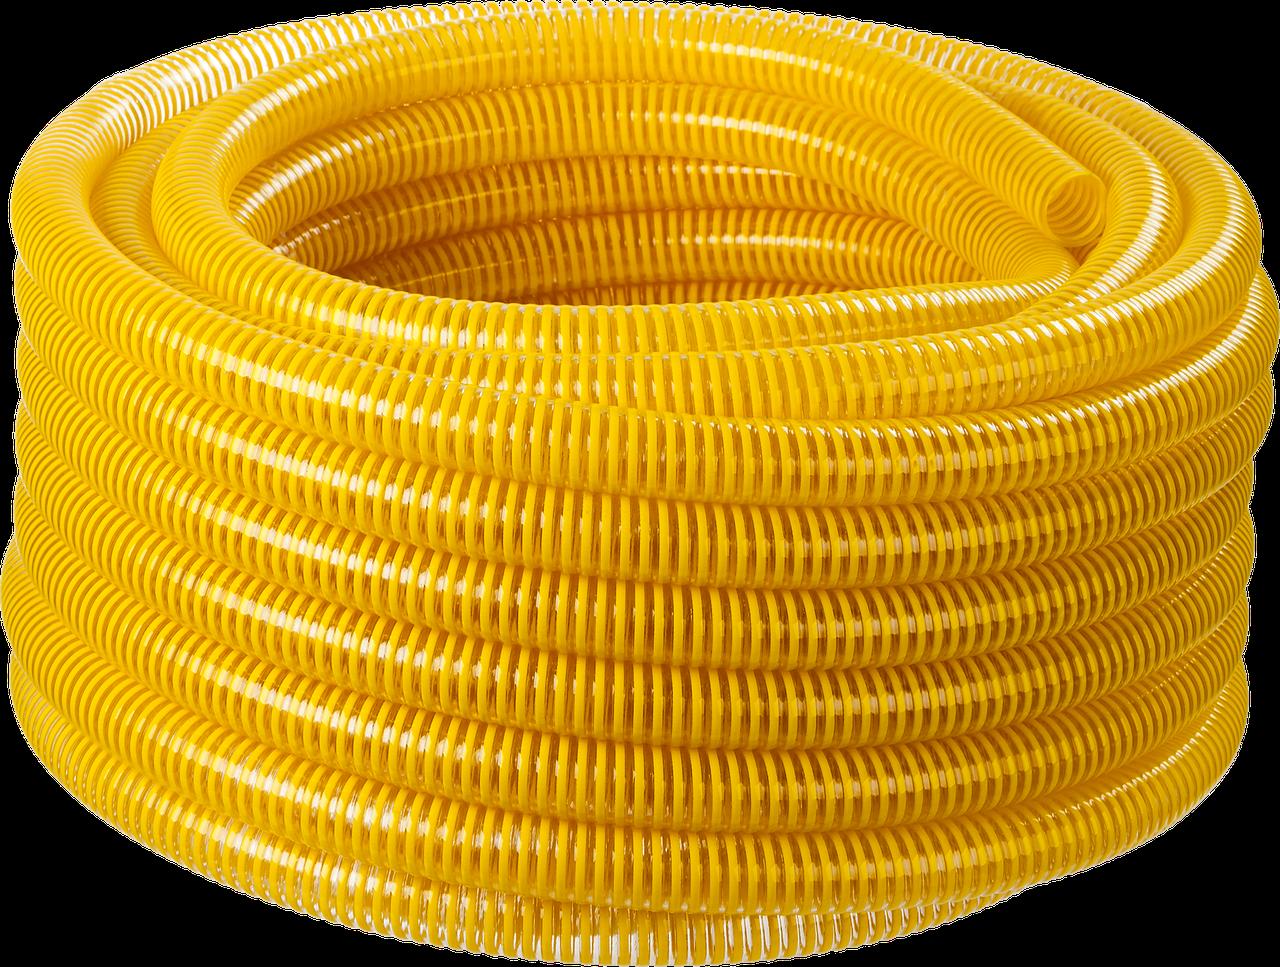 ЗУБР Шланг напорно-всасывающий со спиралью ПВХ, 10 атм, 19мм х 15м 480, 38, 30